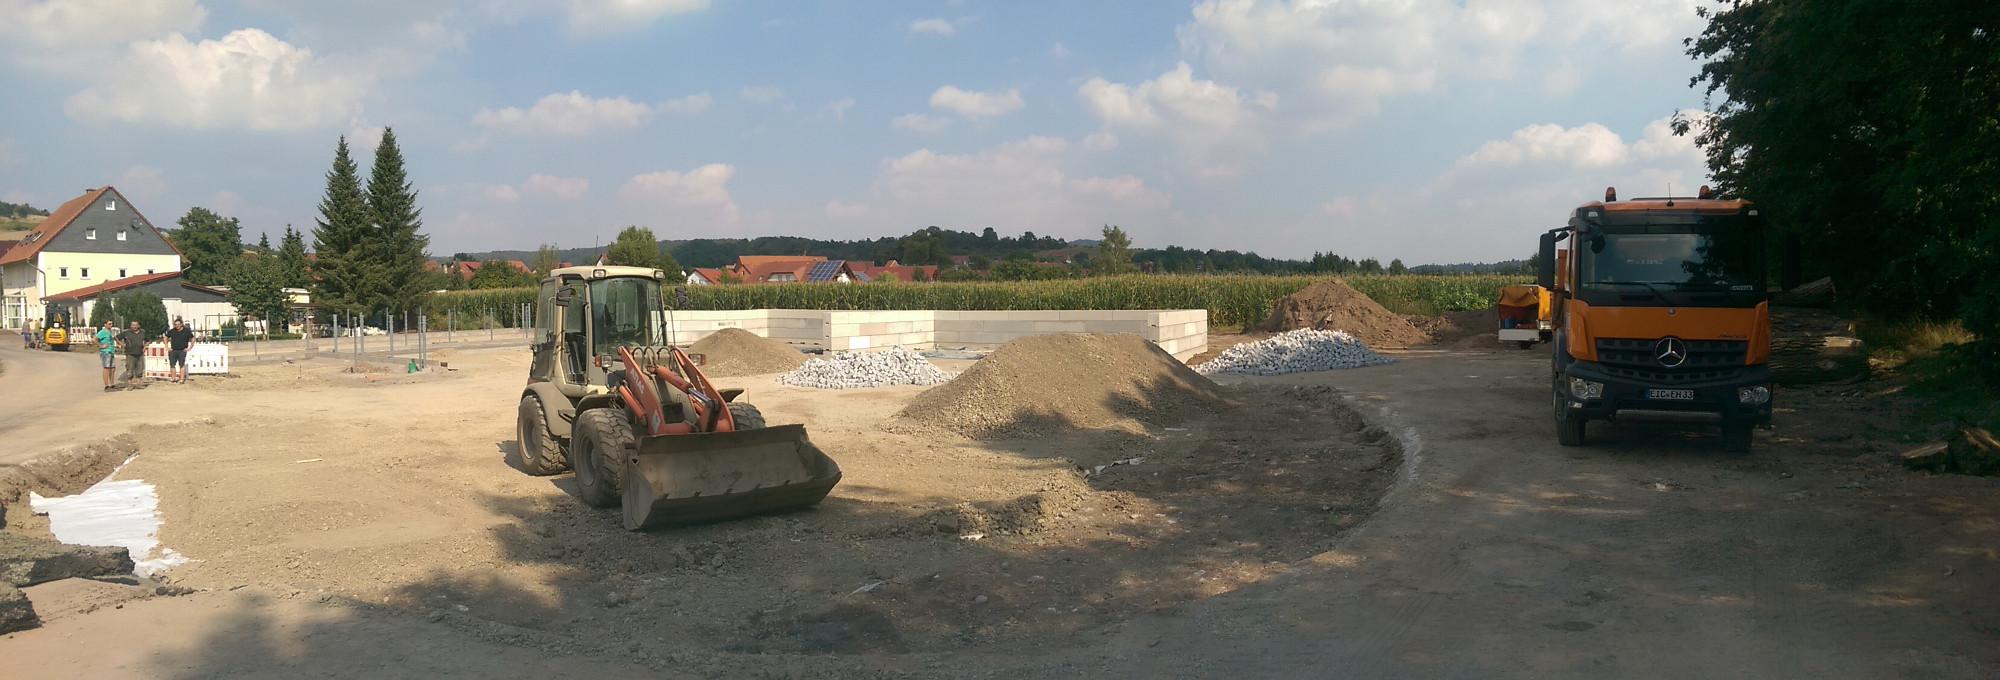 Kirchgandern-Platzgestaltung-Sept.-2016